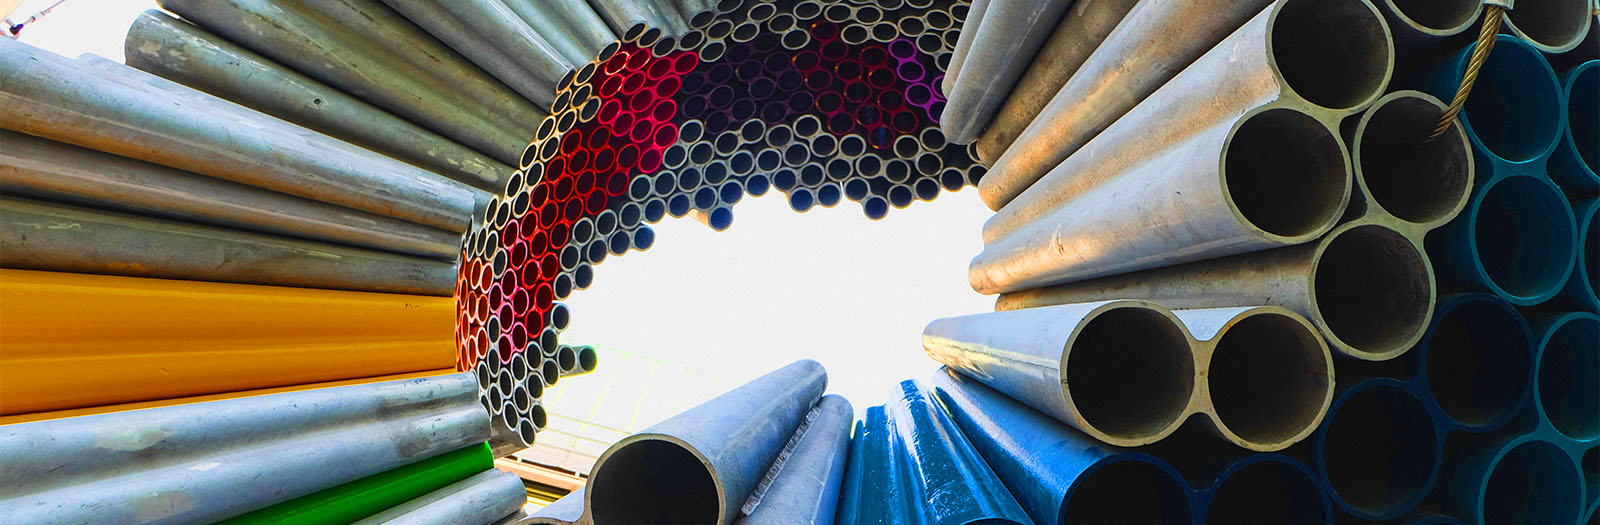 concept photo of spherical steel